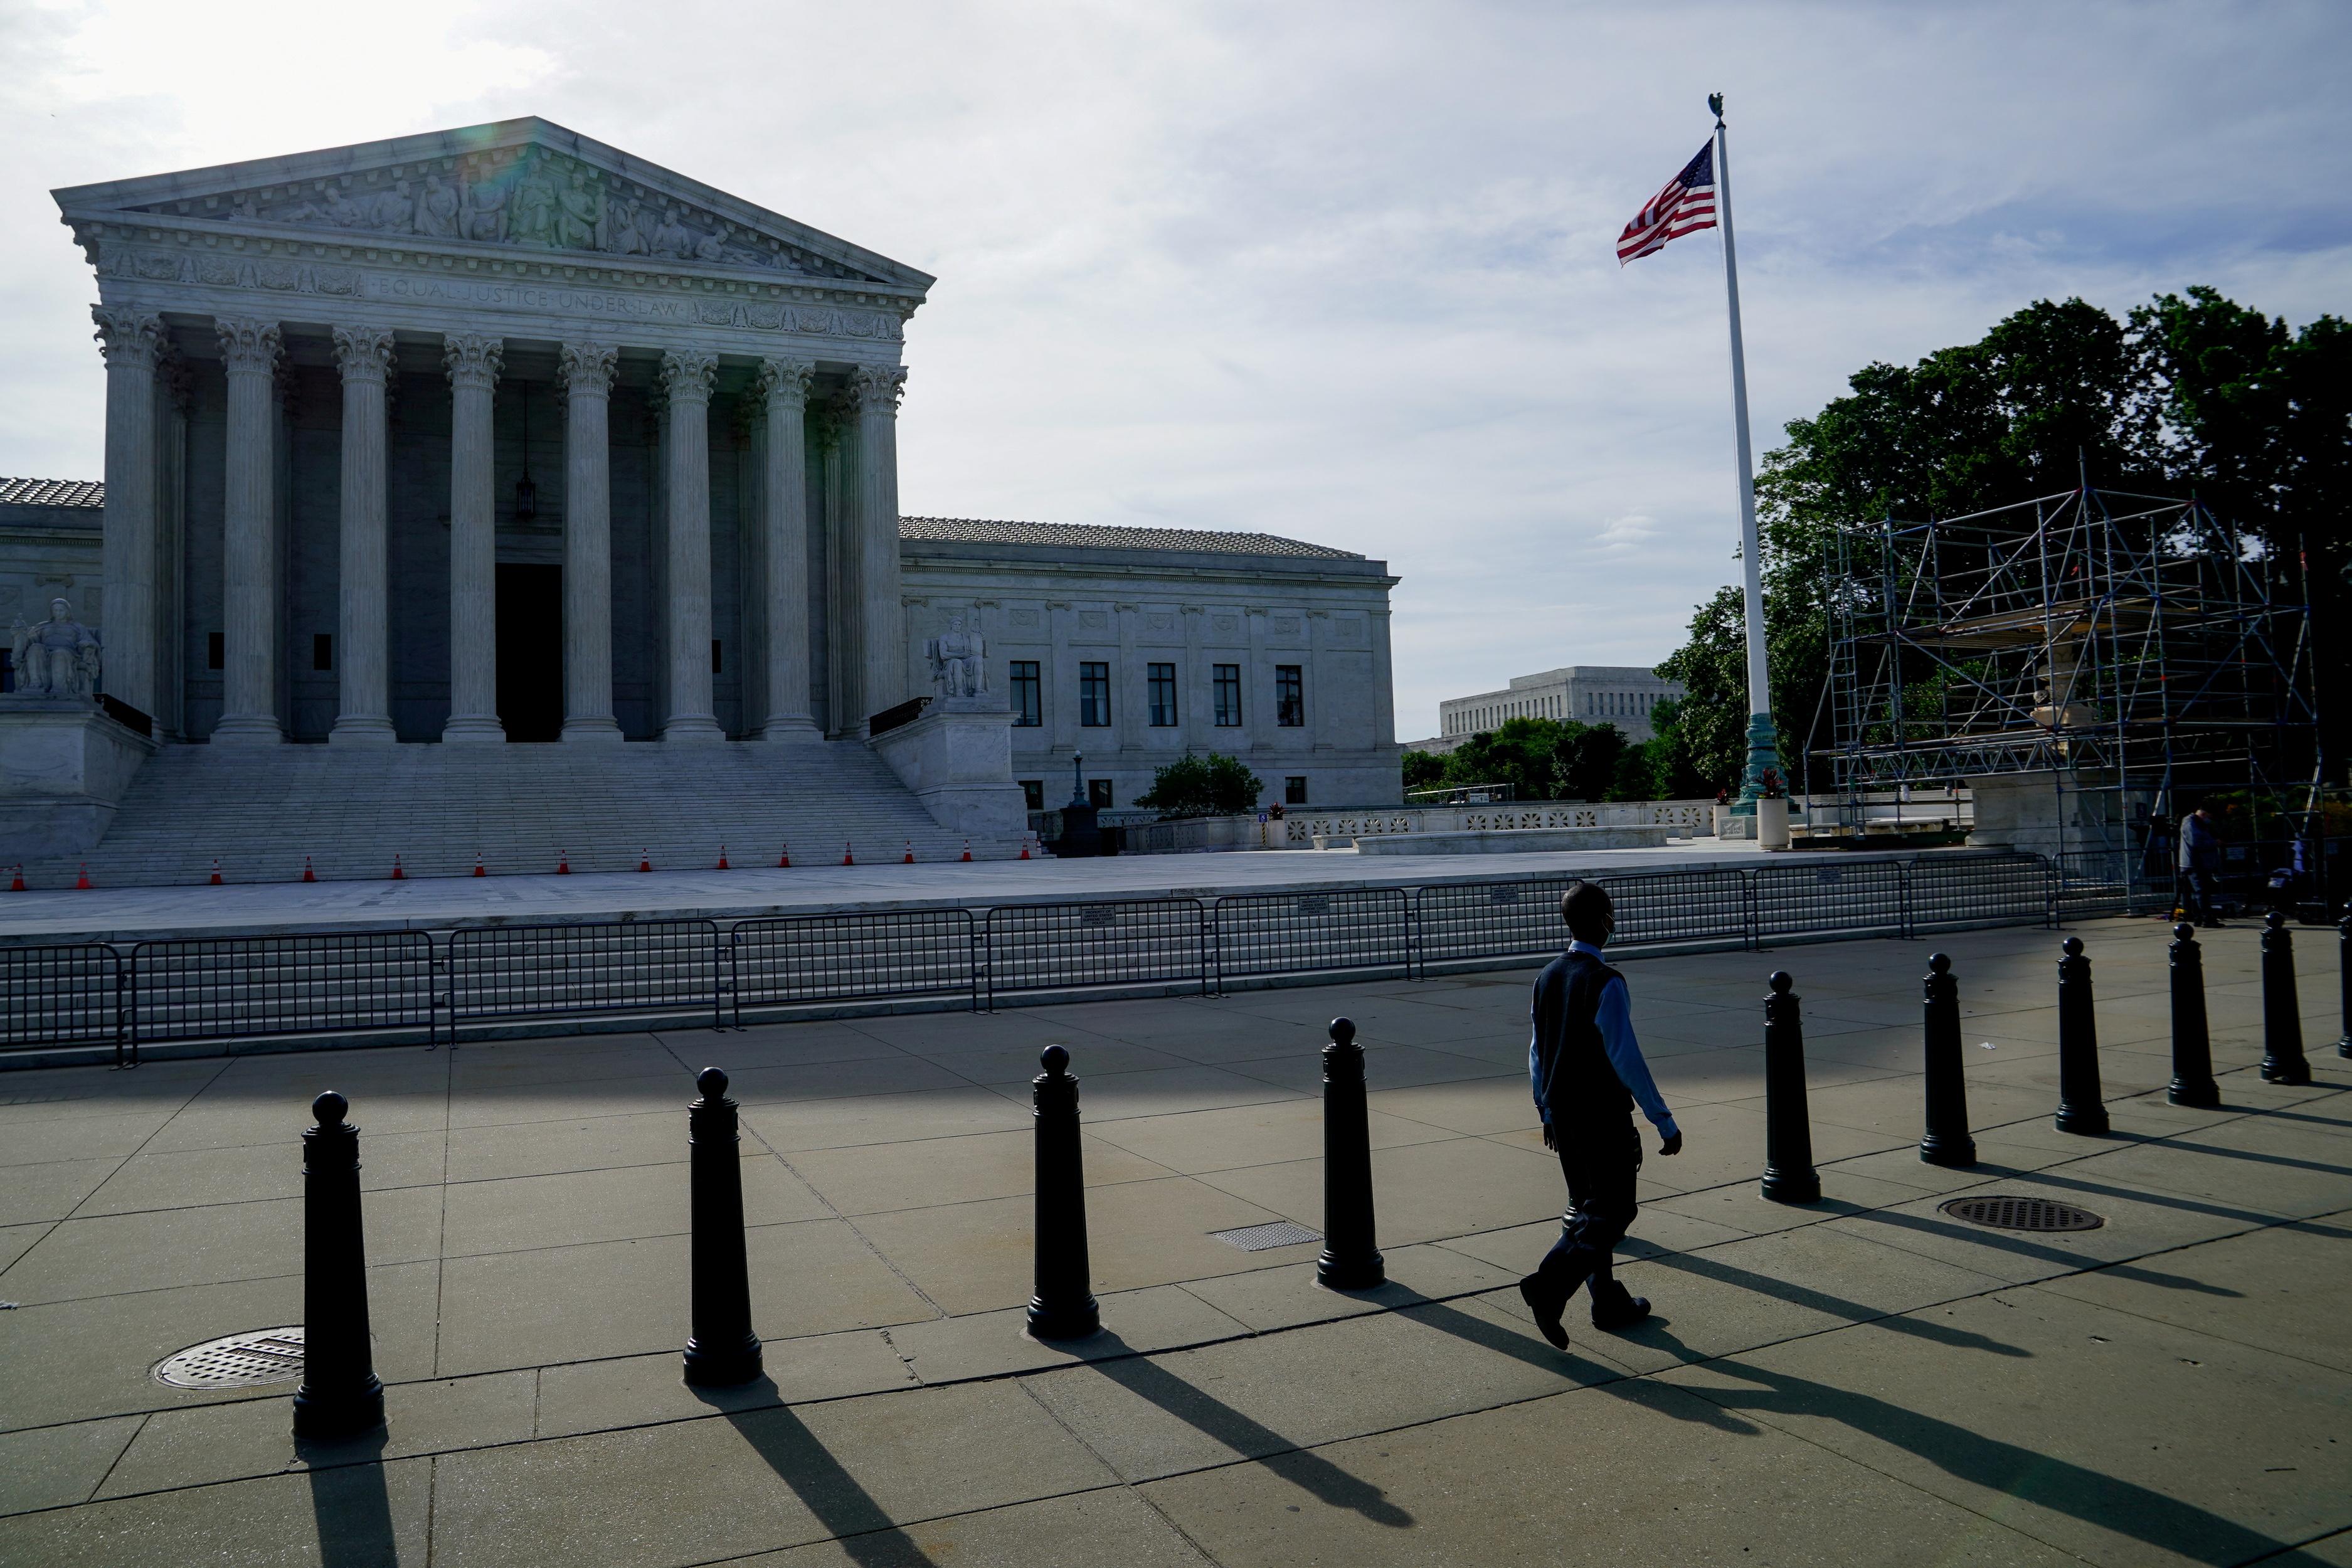 People walk past the U.S. Supreme Court in Washington, U.S., June 1, 2021. REUTERS/Erin Scott